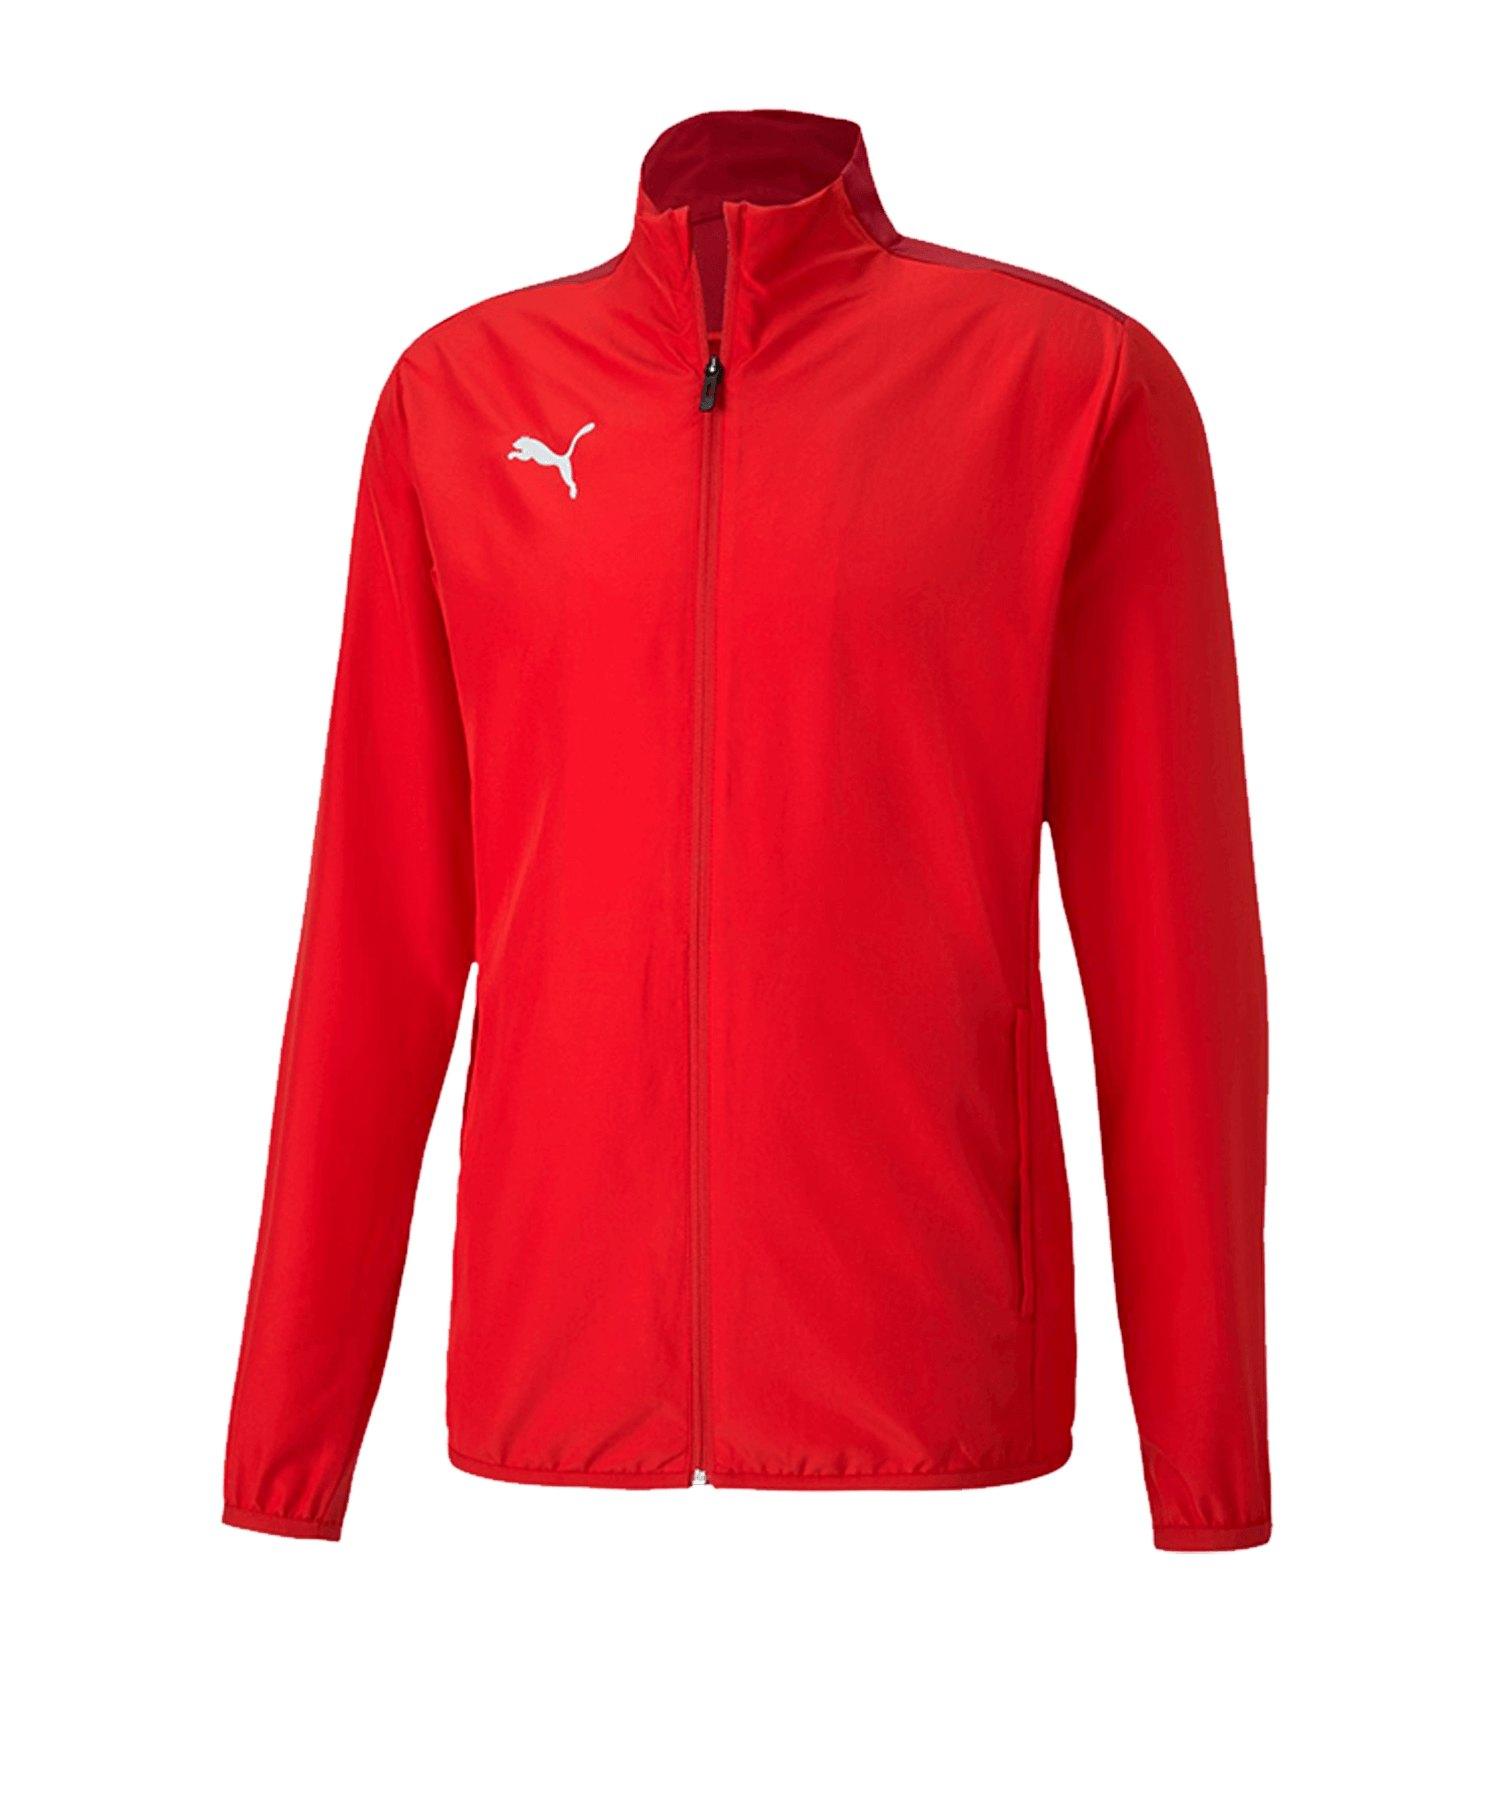 PUMA teamGOAL 23 Sideline Trainingsjacke Rot F01 - rot